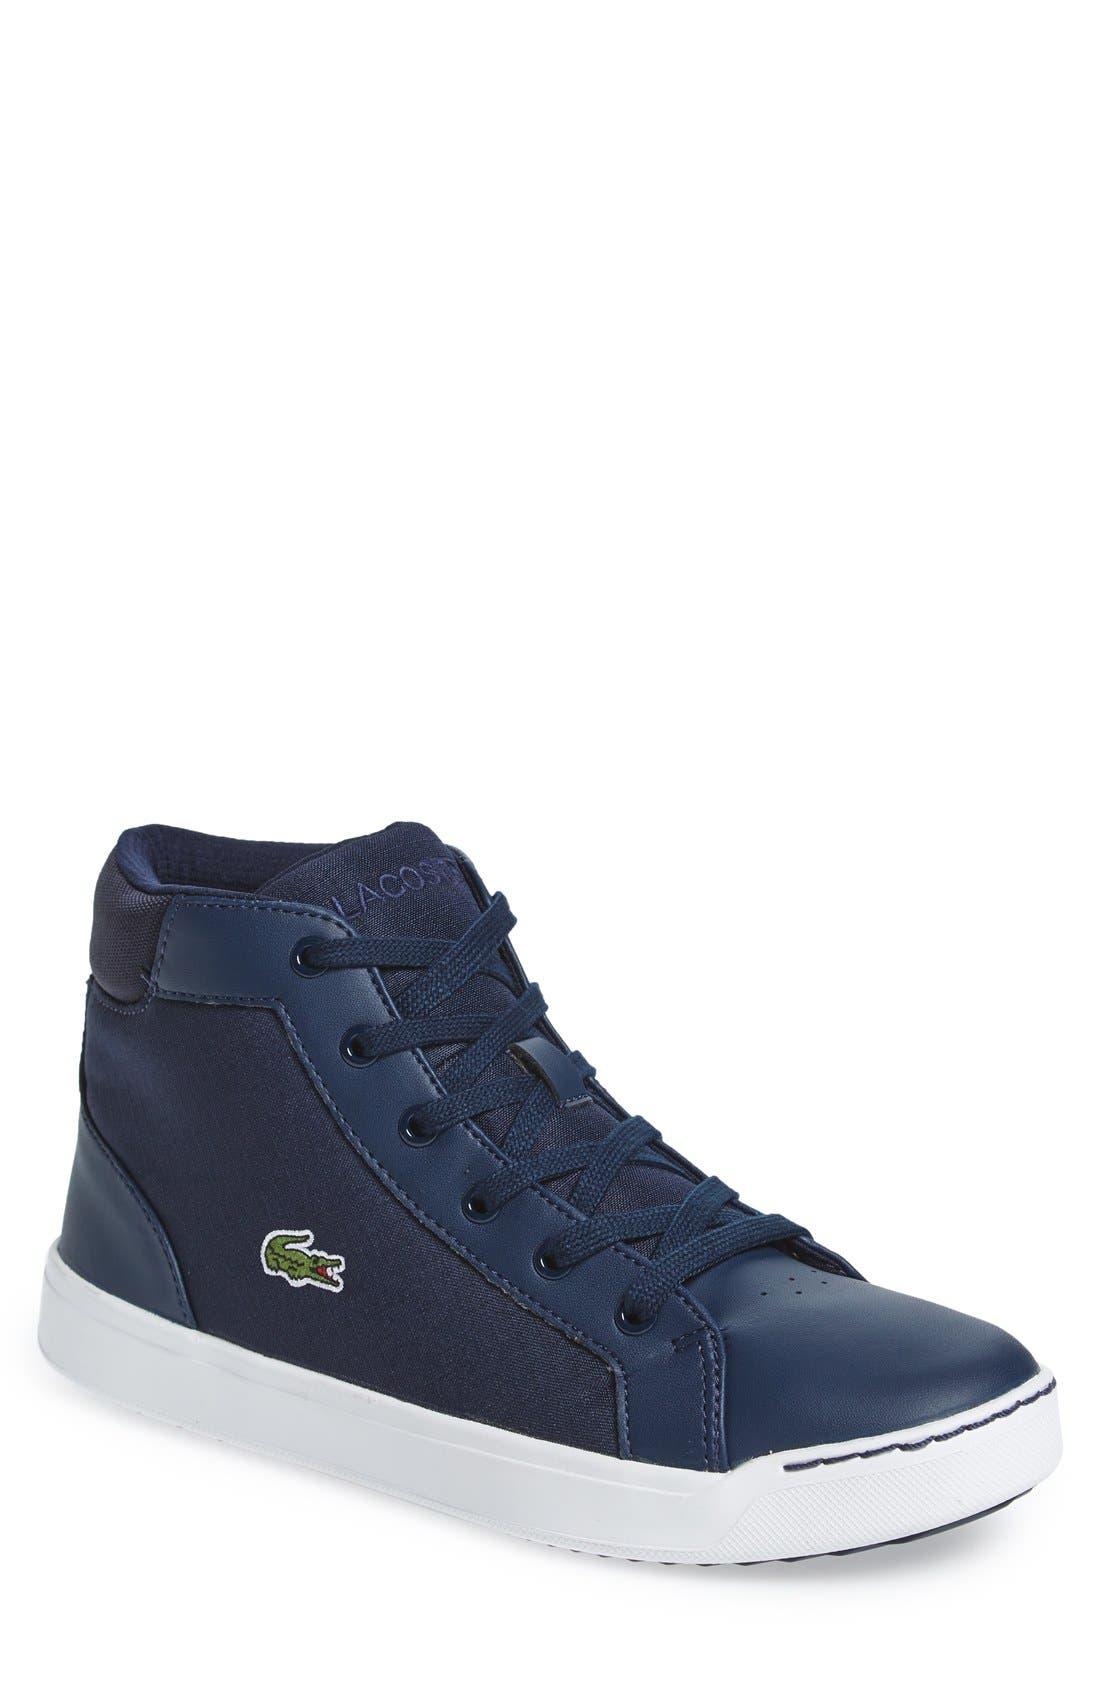 'Explorateur' Midi Sneaker,                             Main thumbnail 1, color,                             410